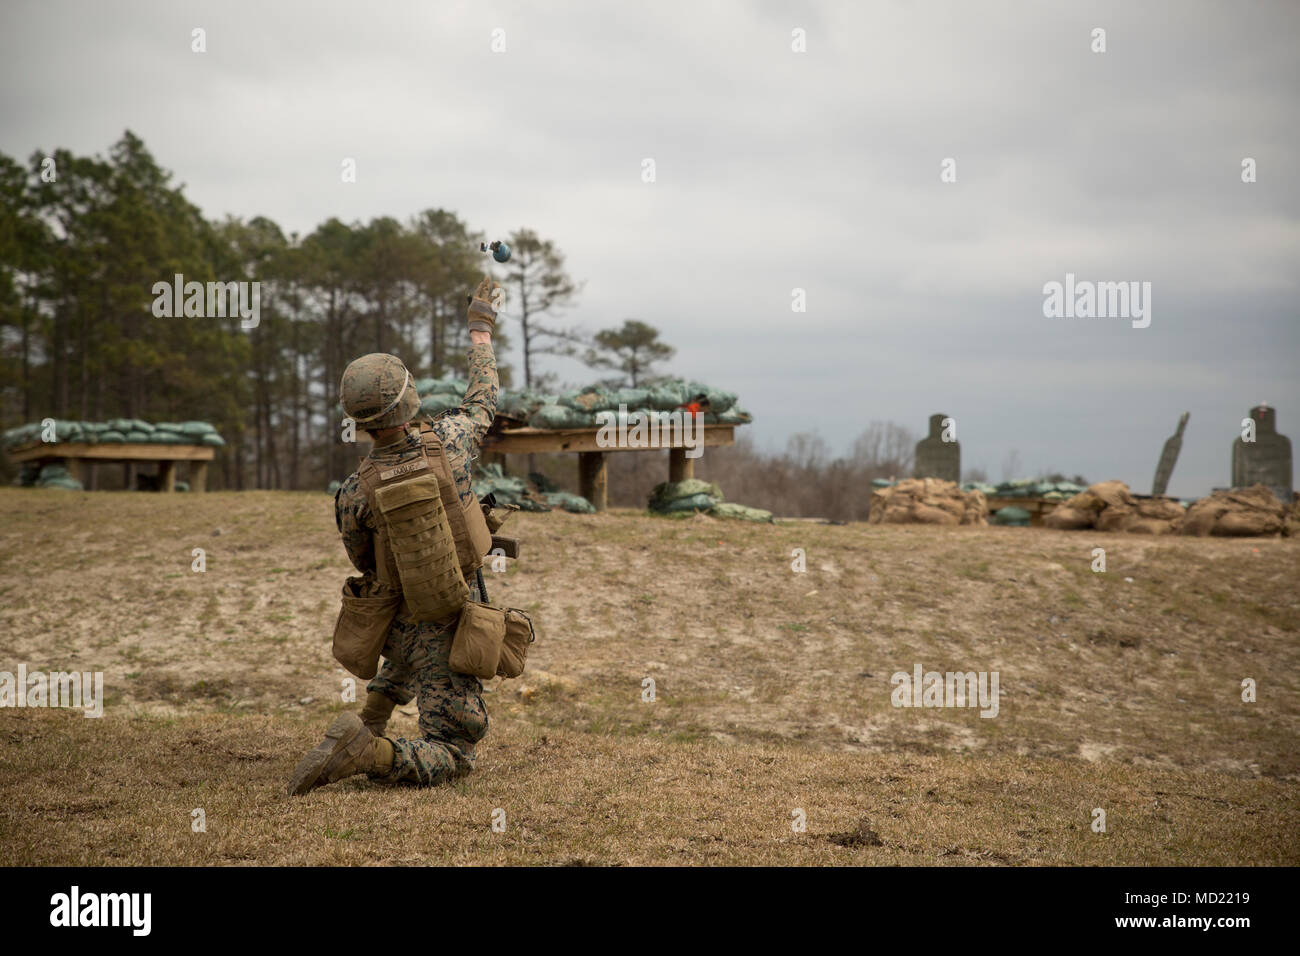 M69 frag grenade